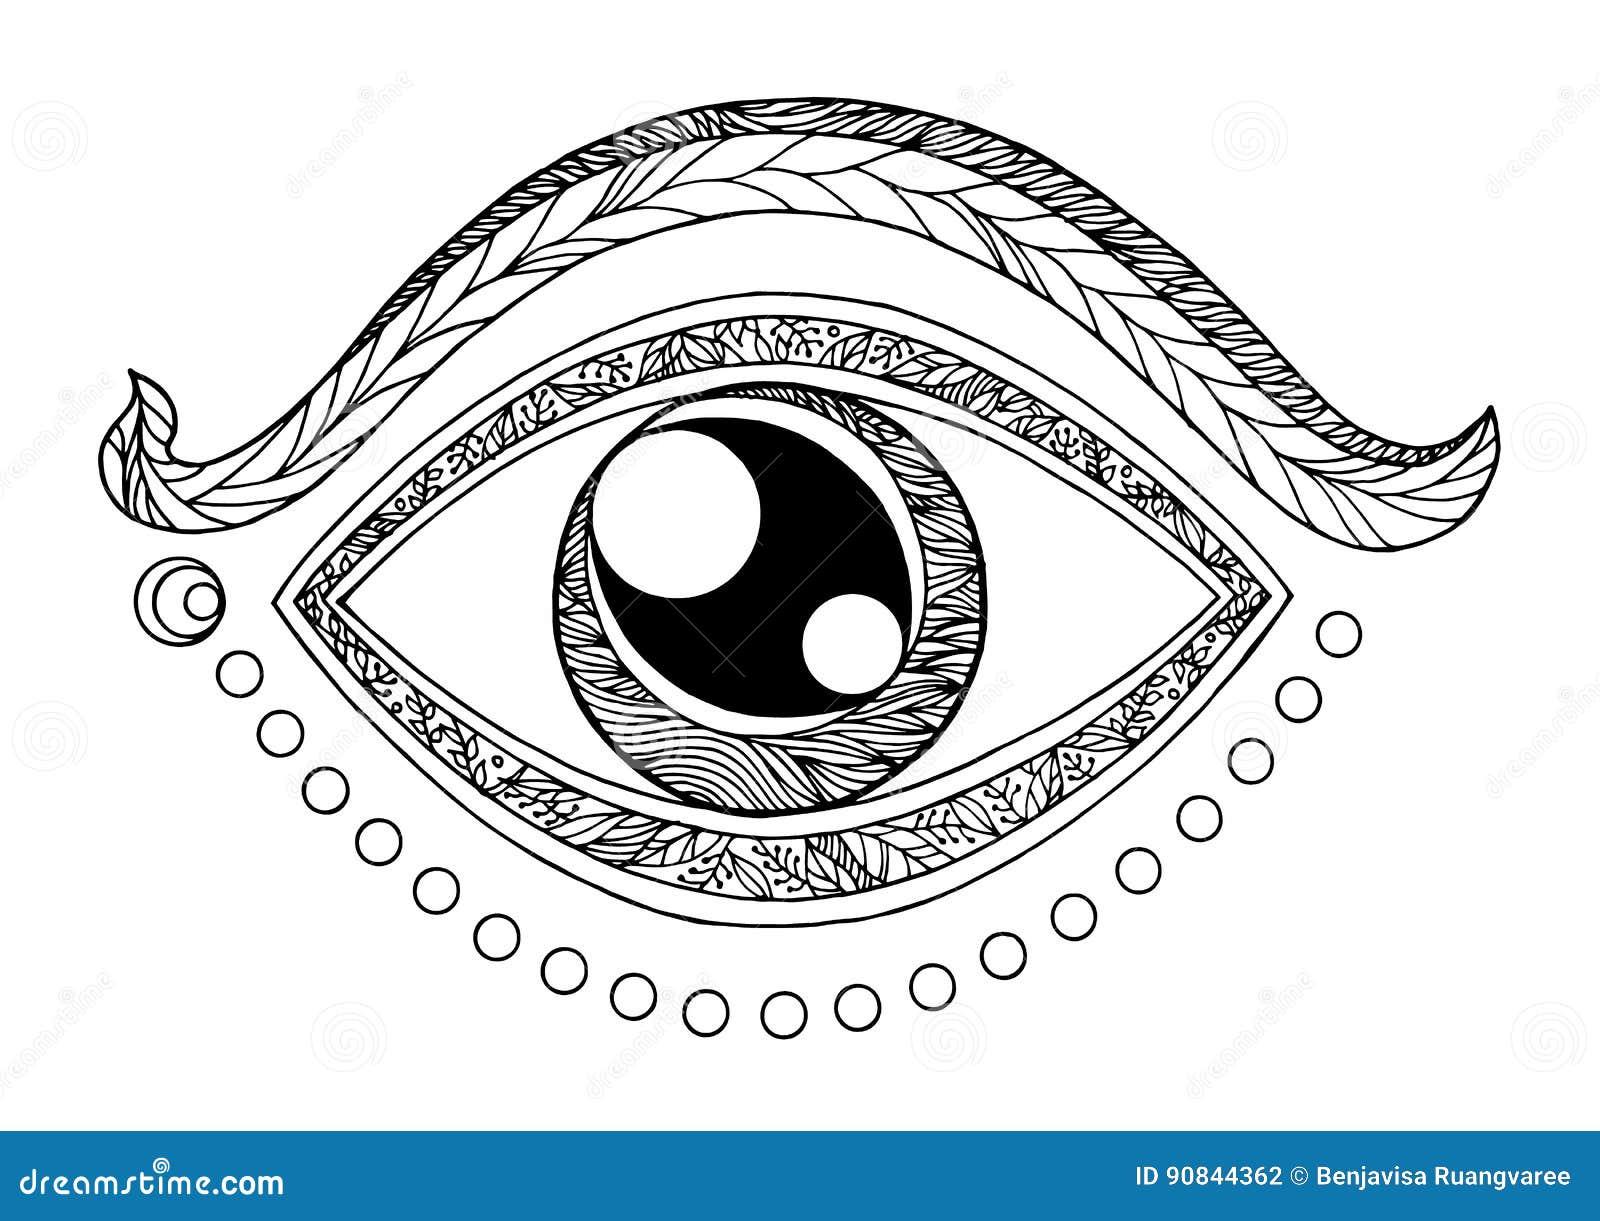 Third Eye Chakra Symbol Drawing Design Vector Illustration Stock